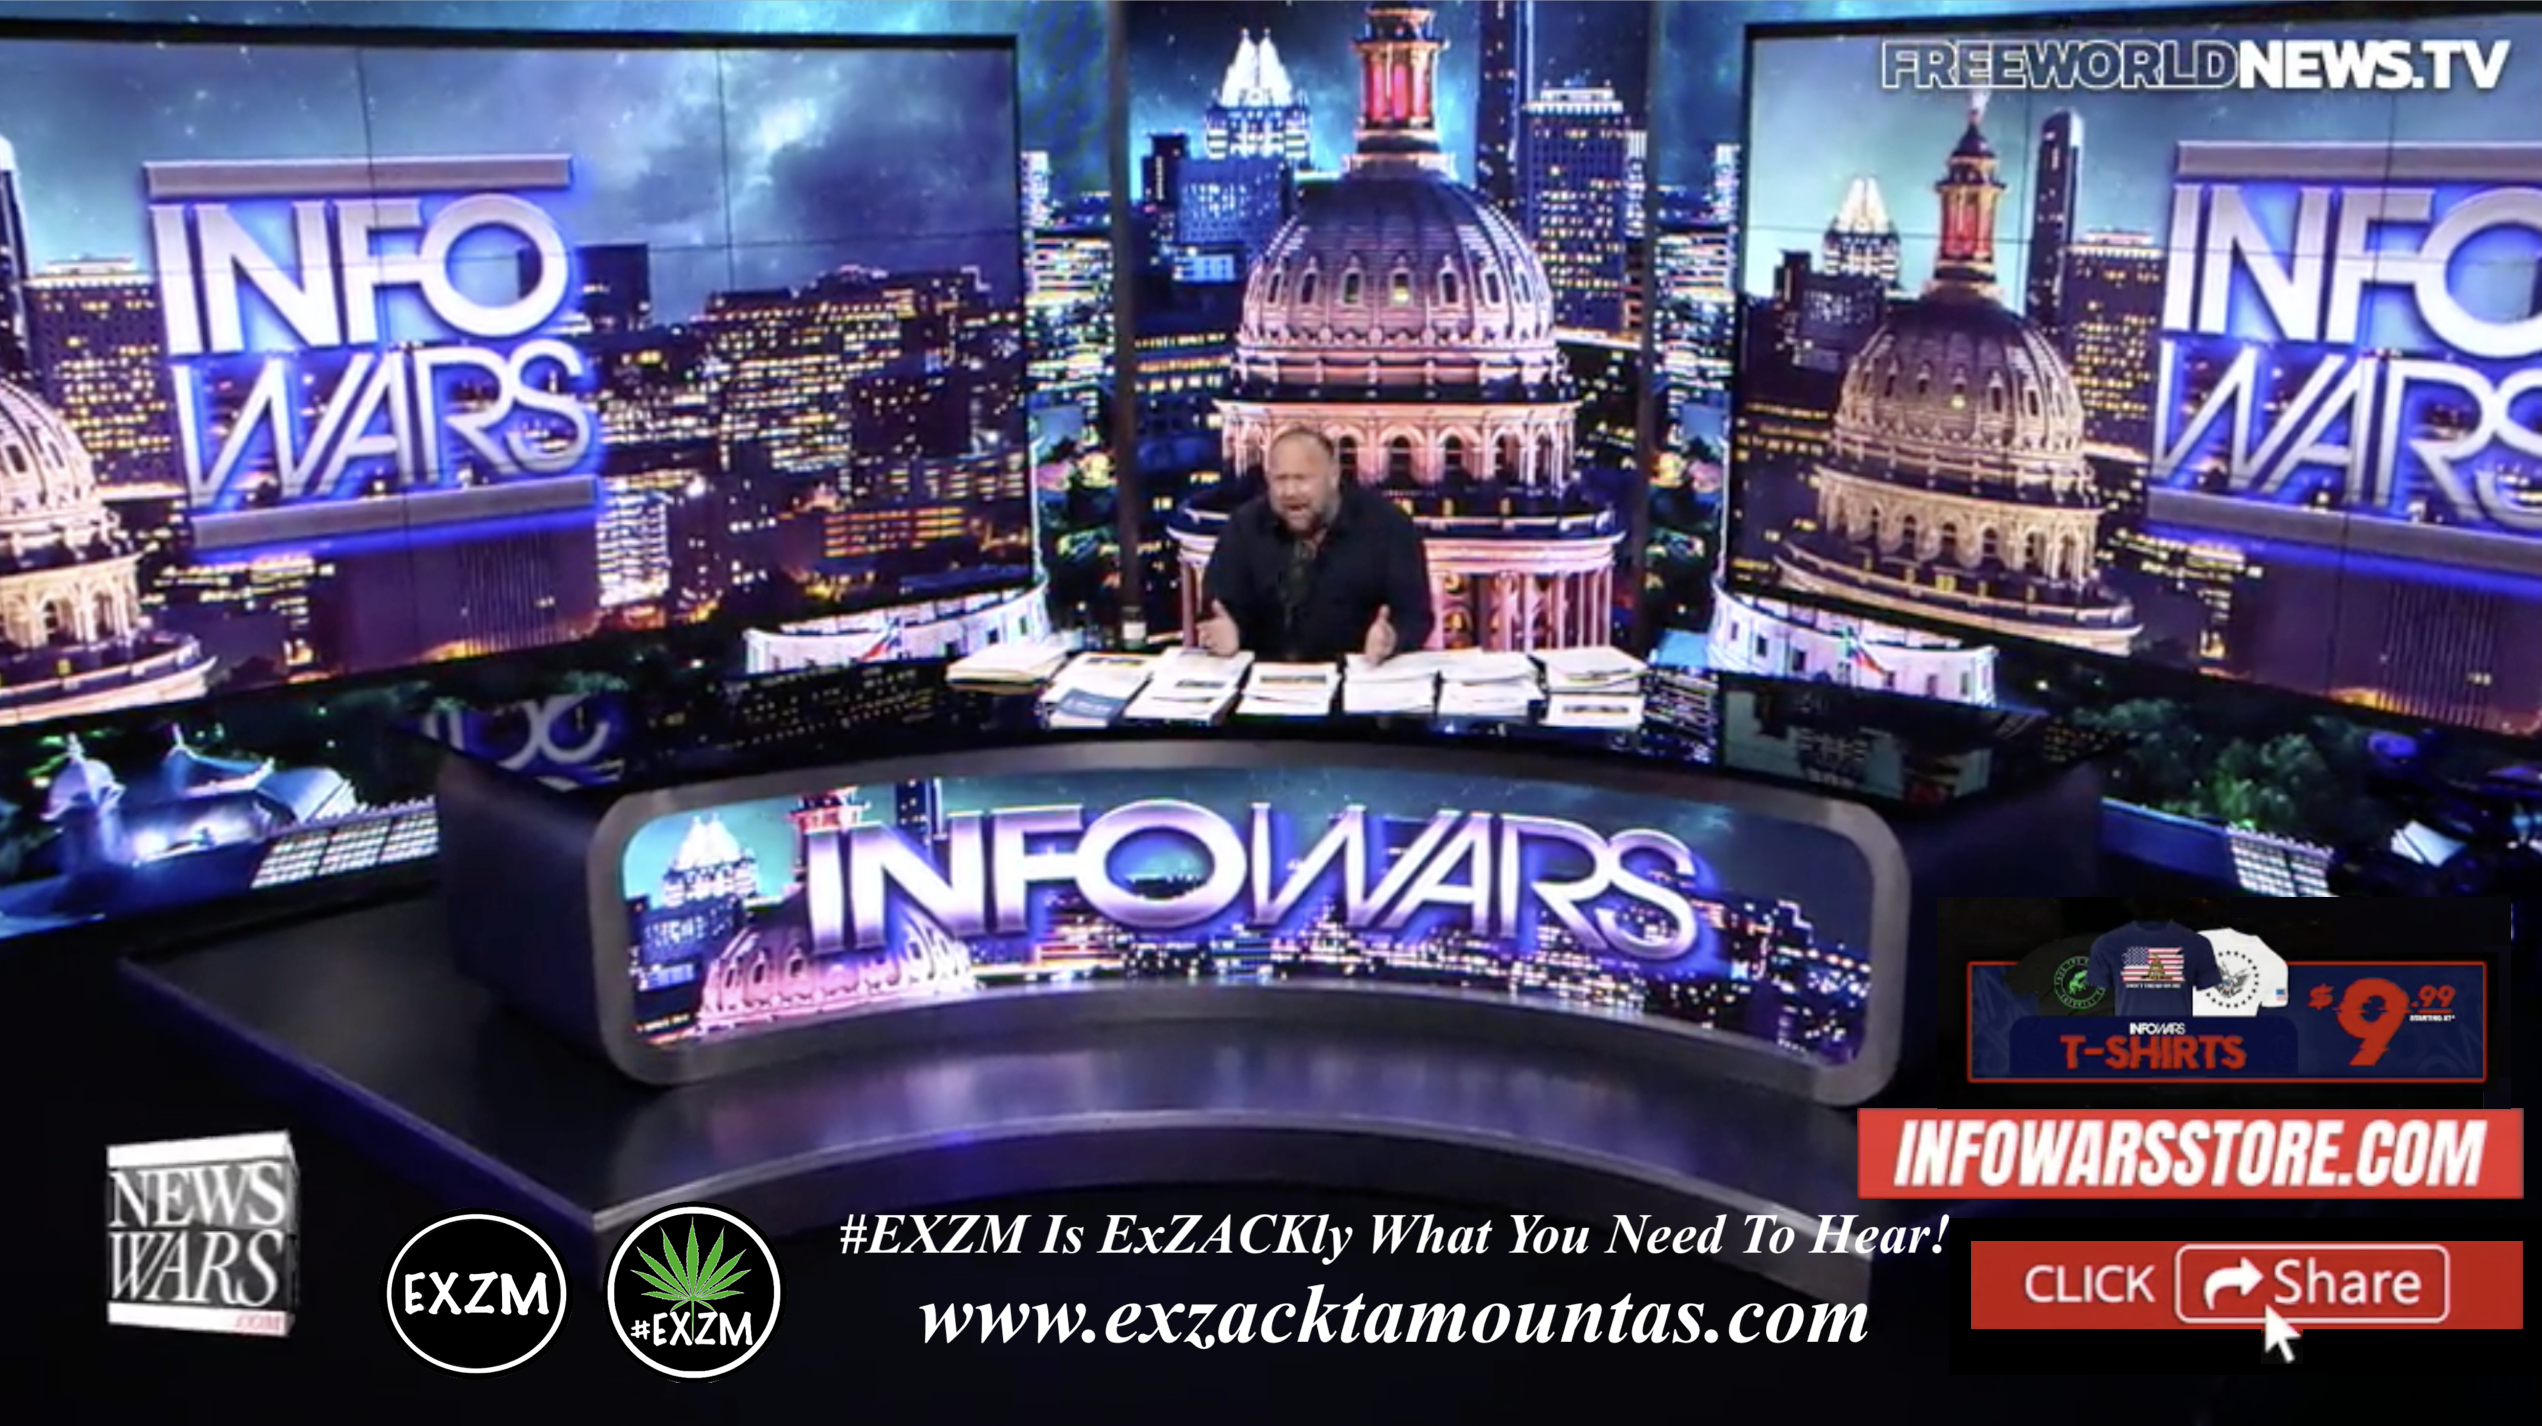 Alex Jones Live In Infowars Studio Free World News TV EXZM Zack Mount October 4th 2021 copy